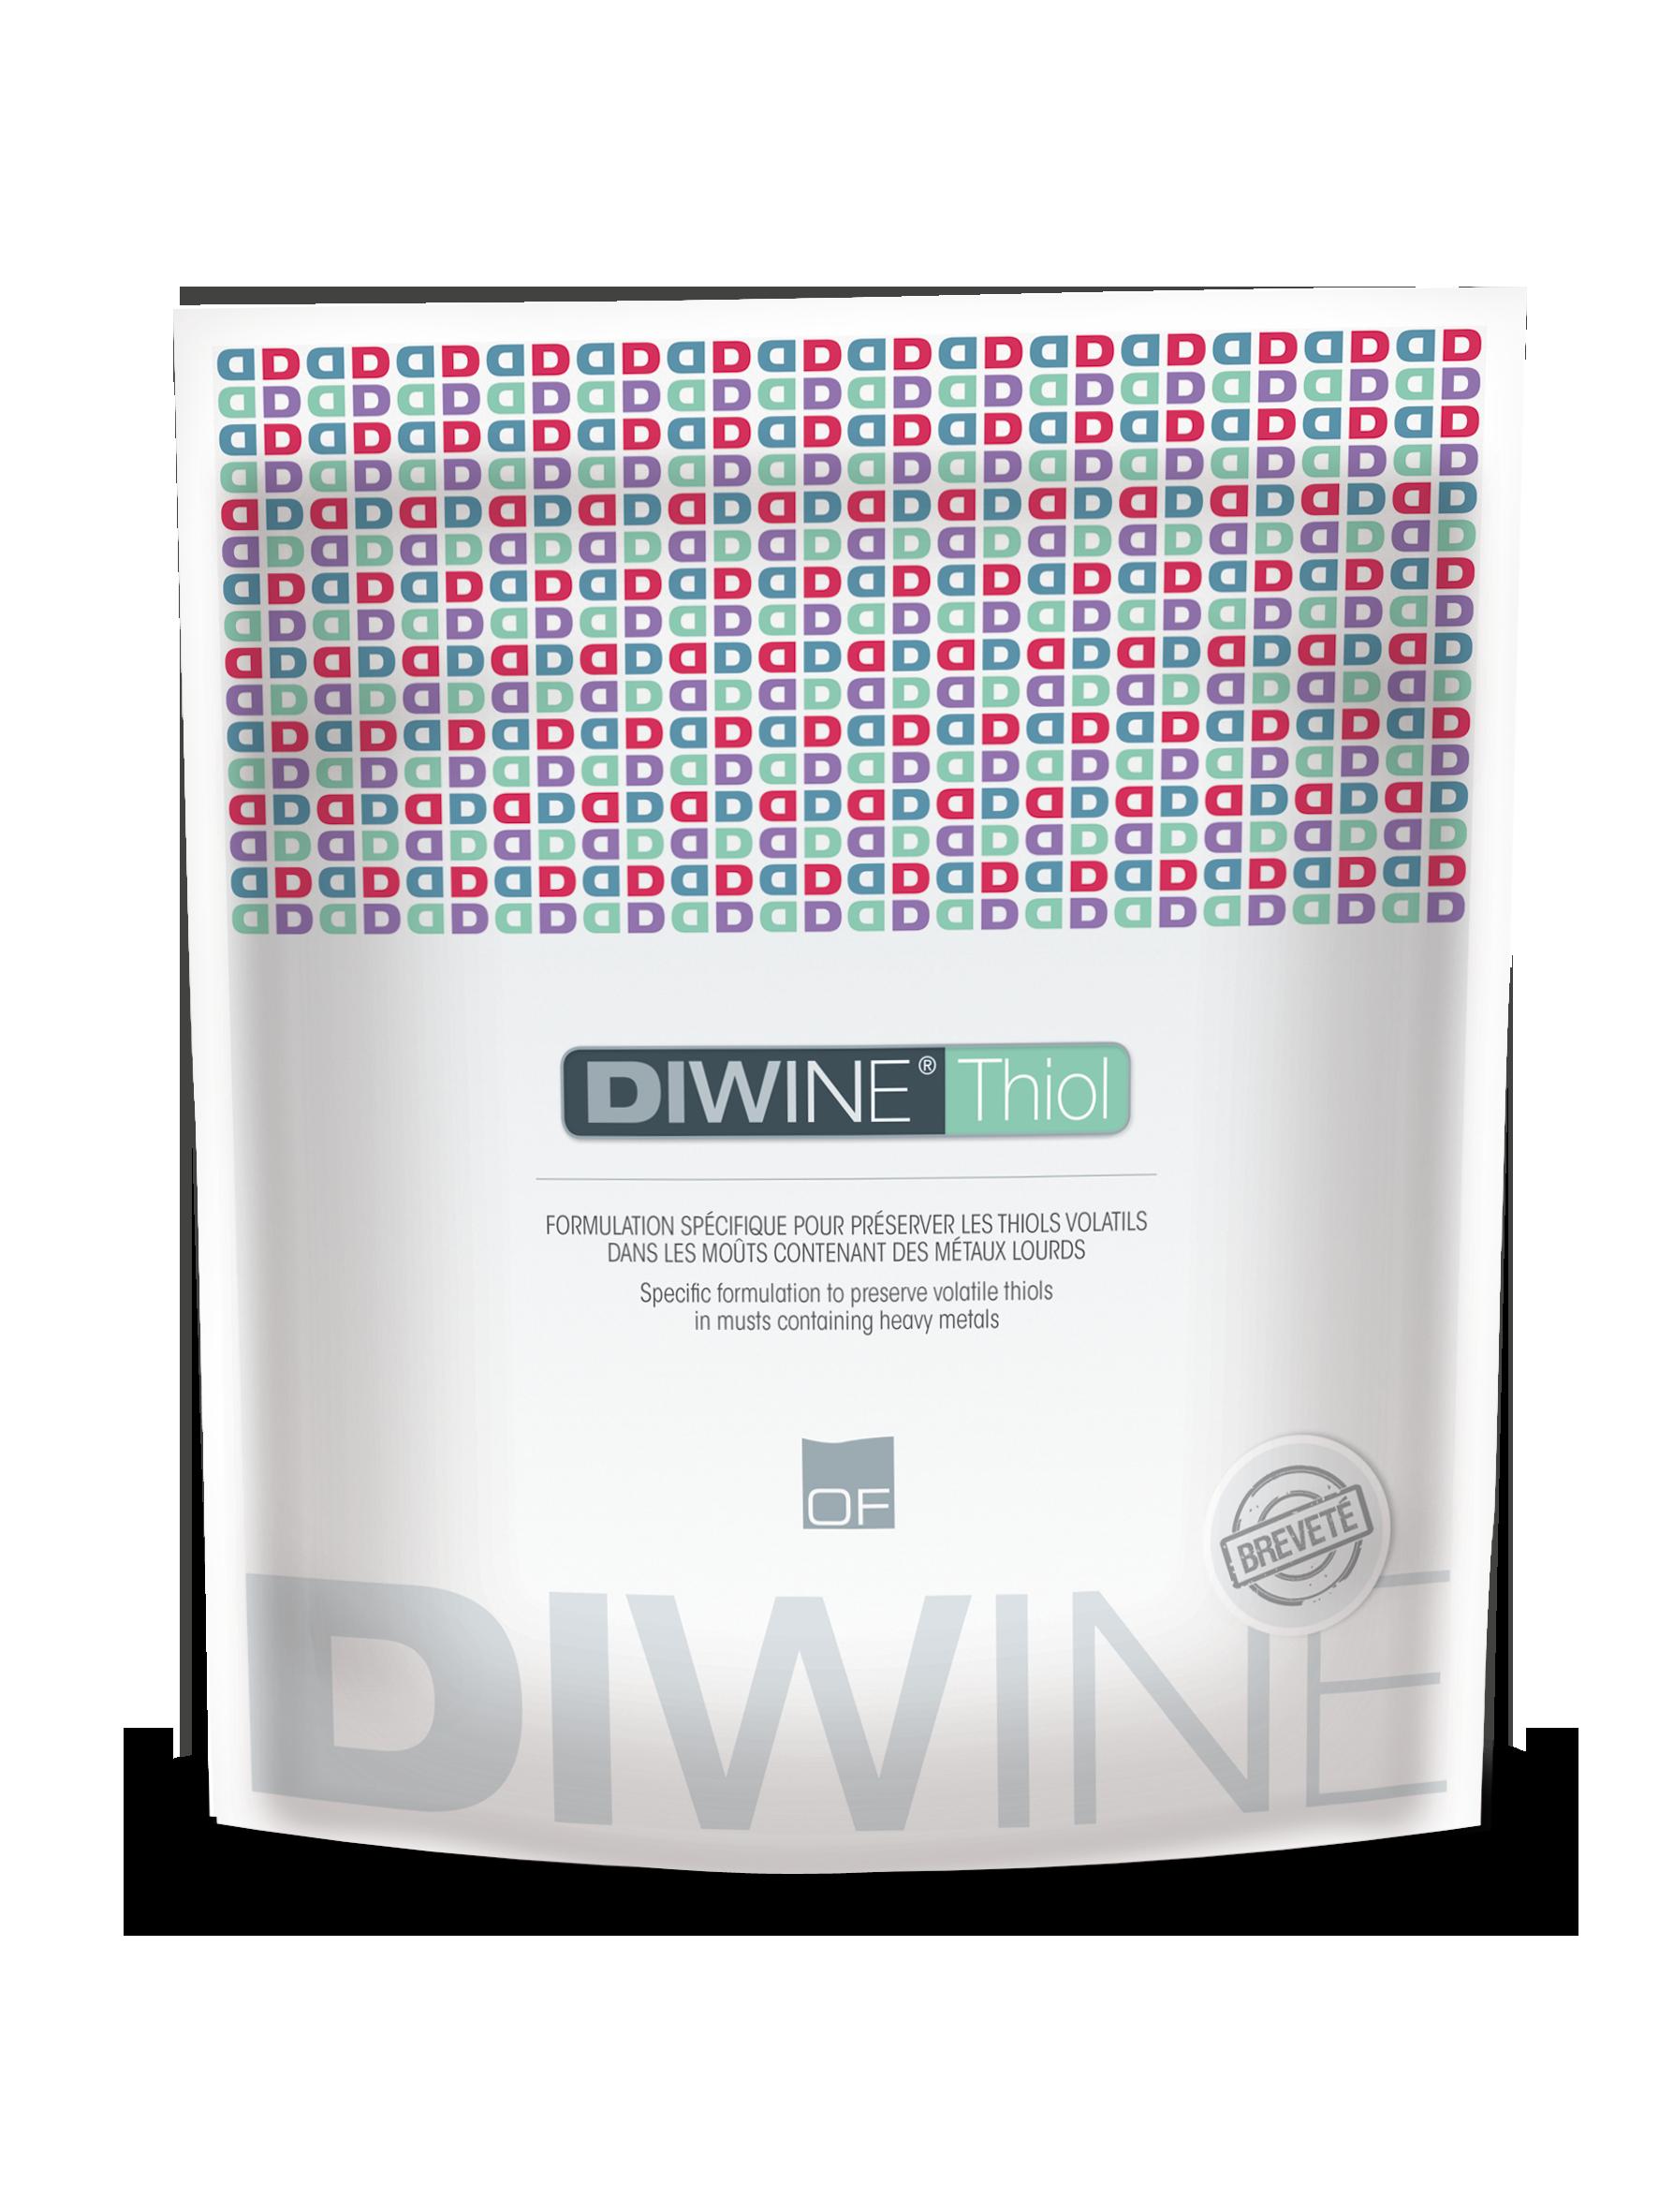 DIWINE-THIOL-mockup-NEW2016